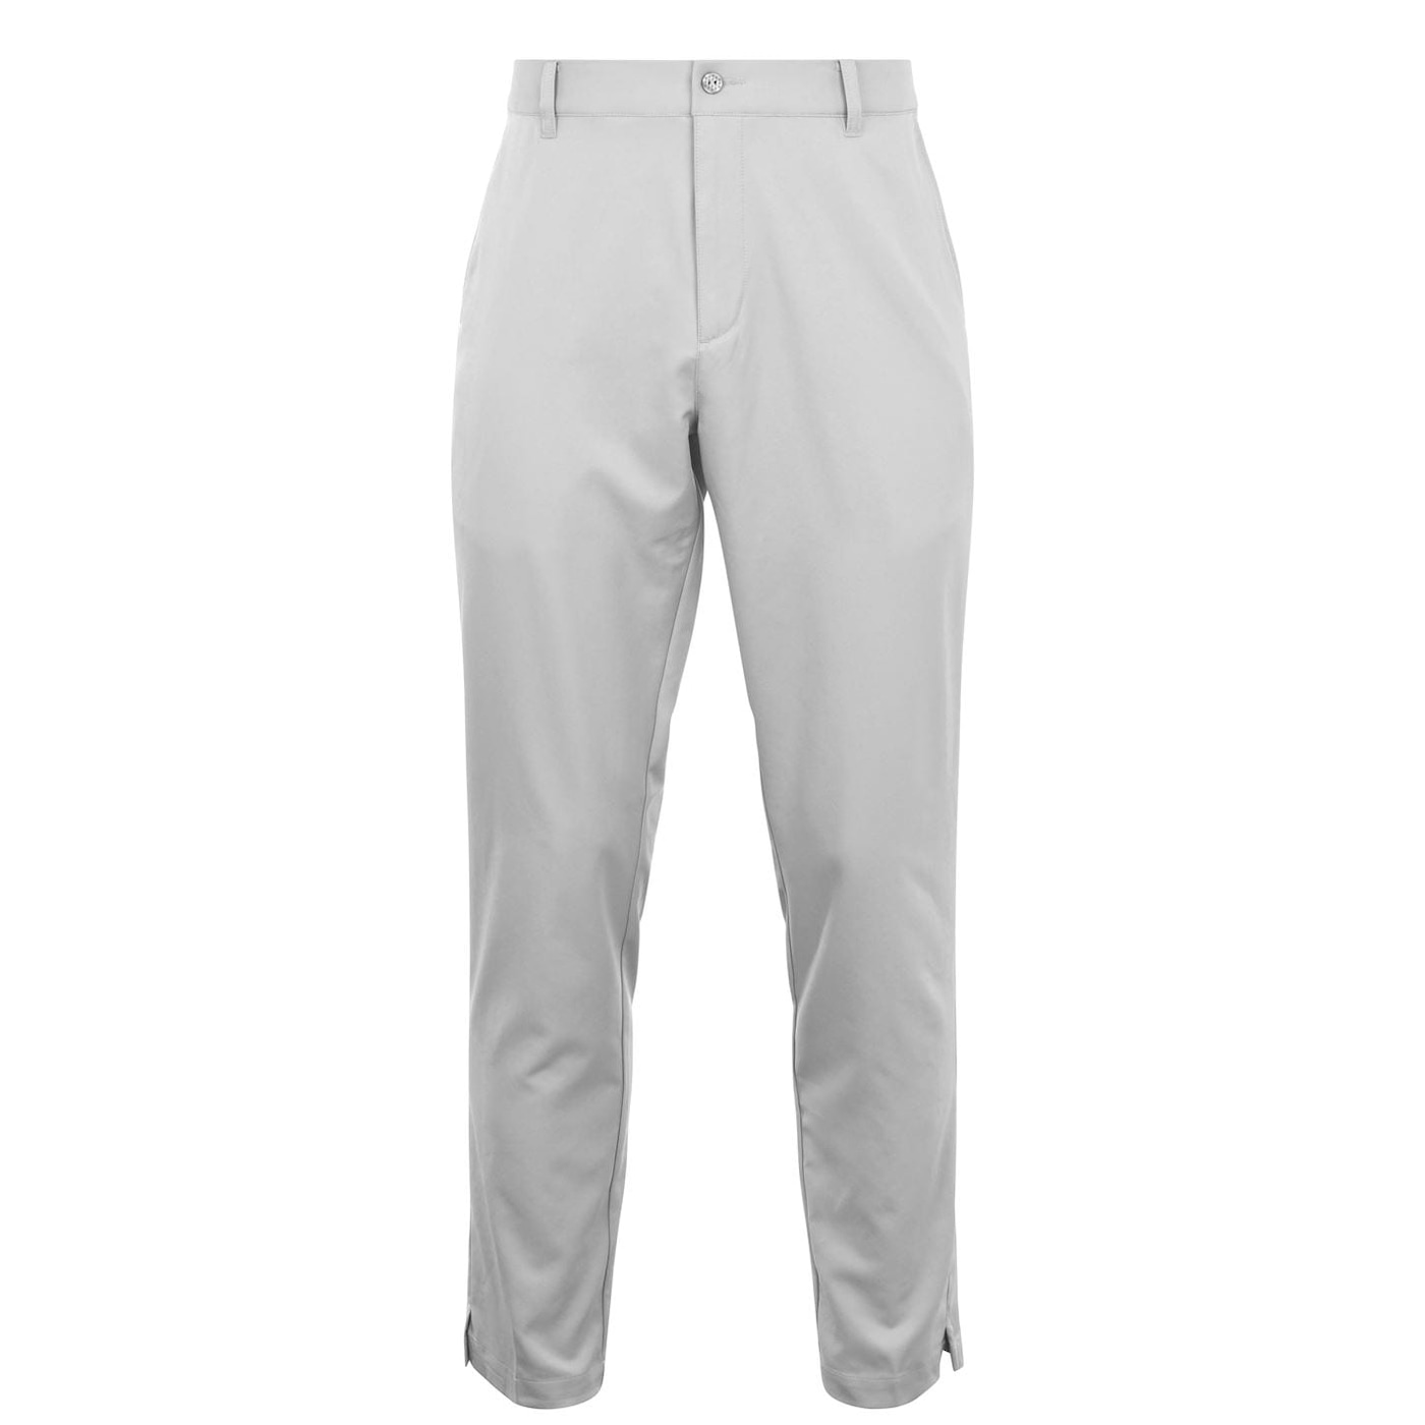 Puma Golf Trousers Mens